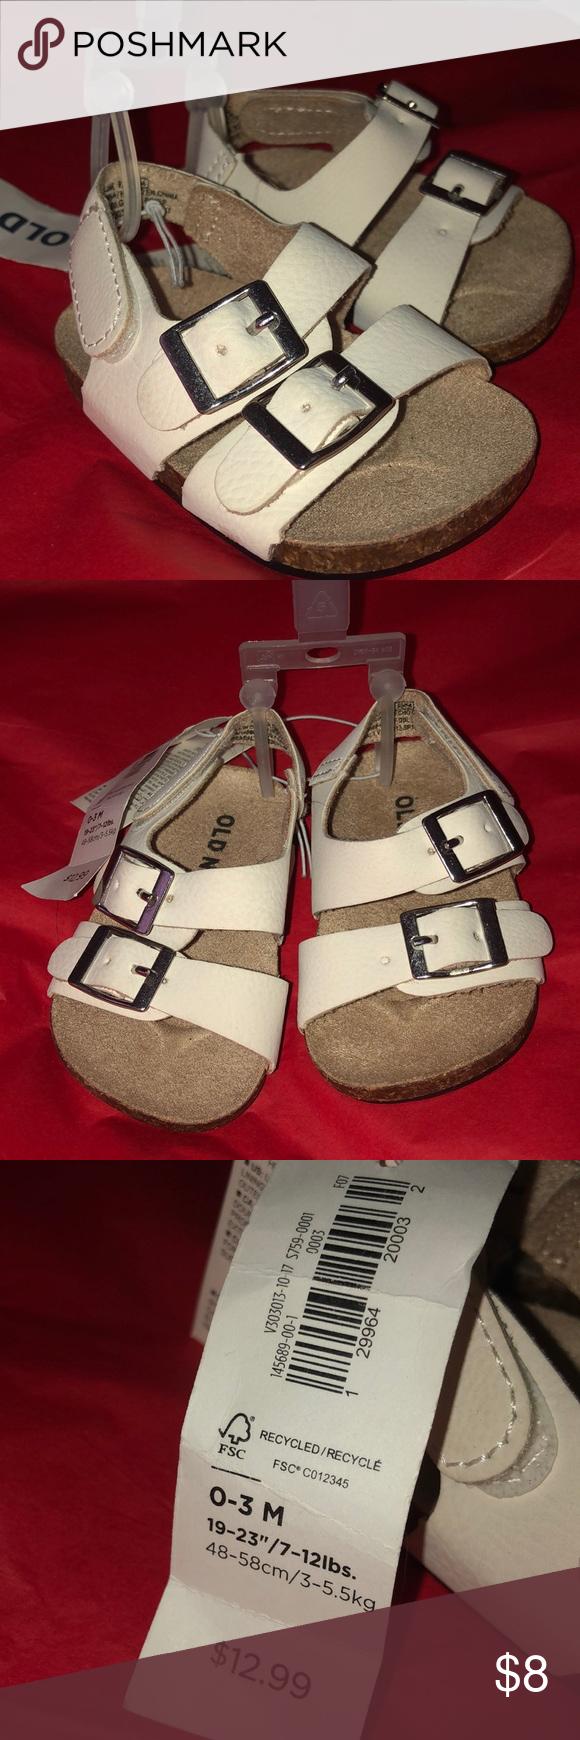 Baby Birkenstock S Size 0 3 Month Baby Birkenstocks Girls Shoes Navy Shoes